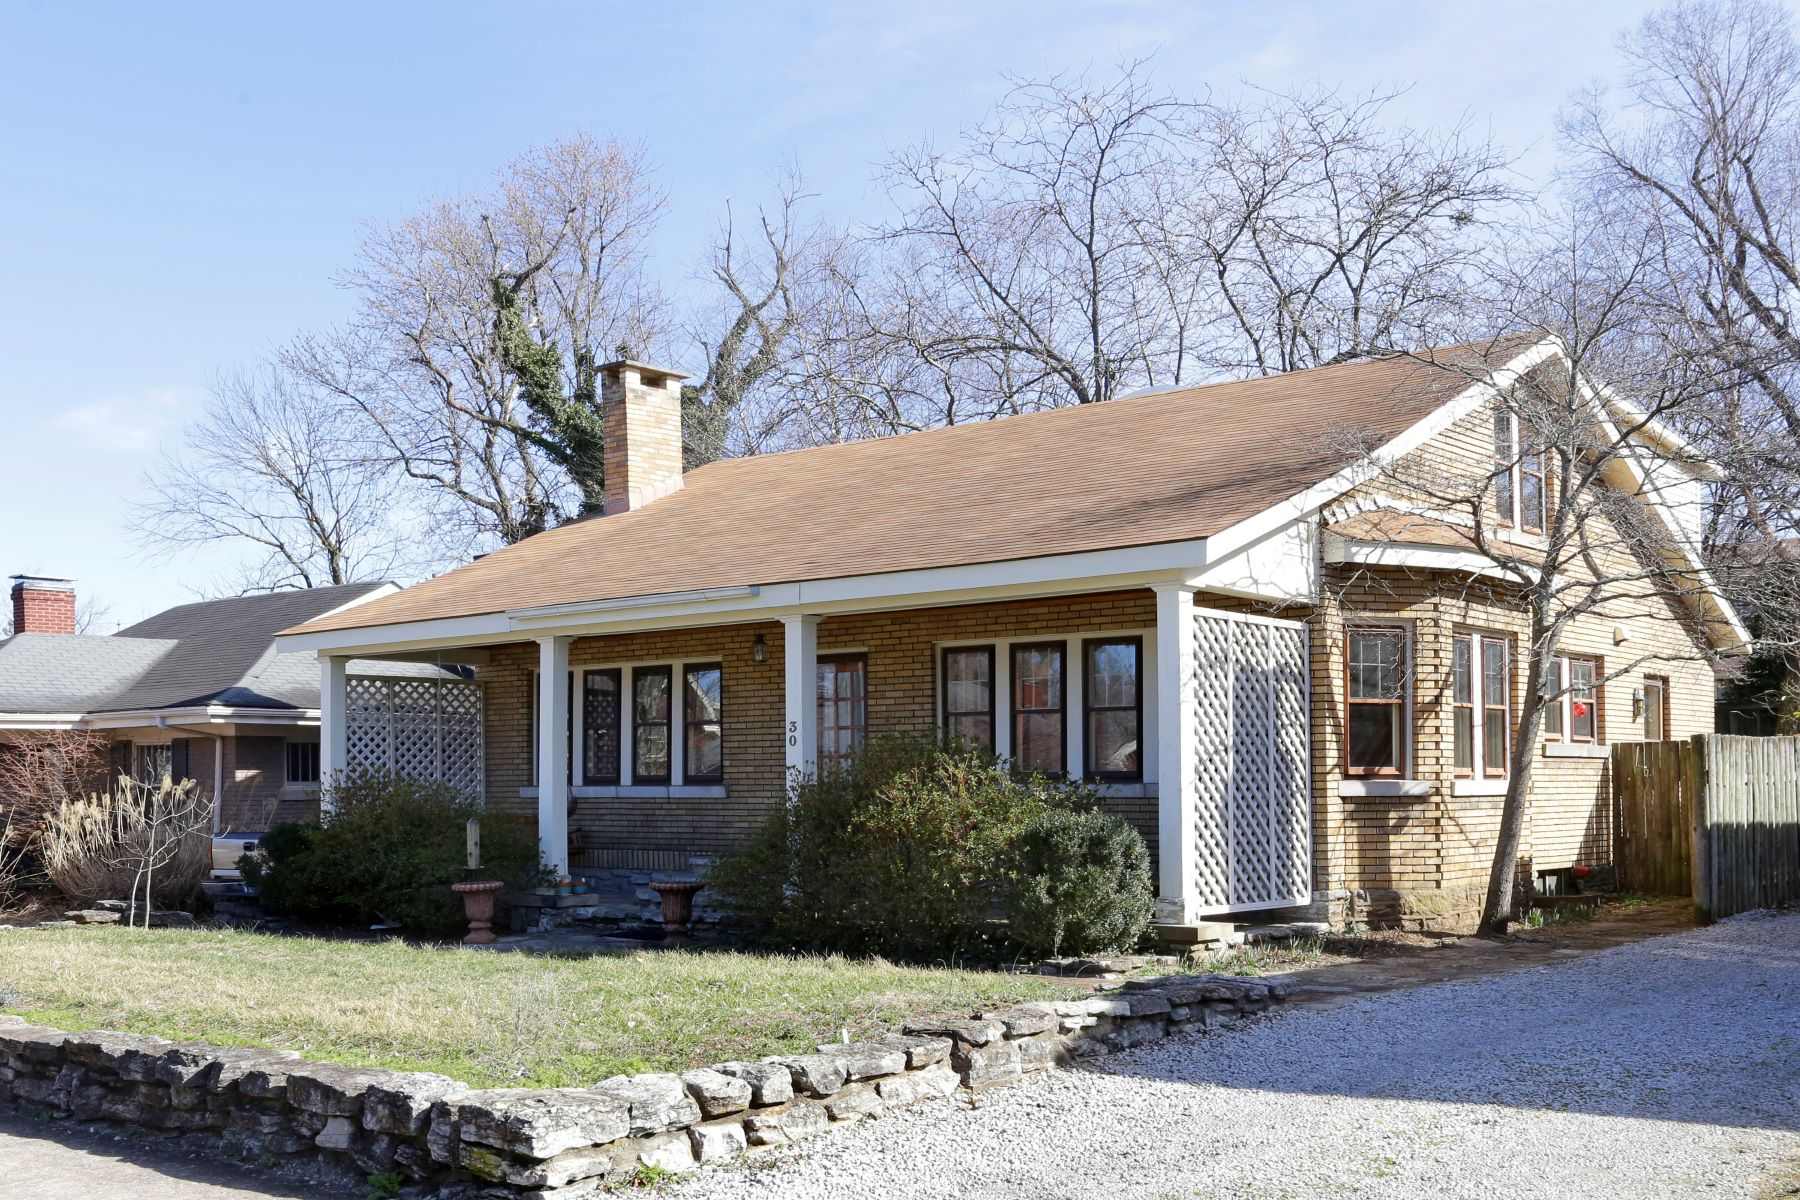 Single Family Home for Sale at 30 Richmond Avenue Lexington, Kentucky 40502 United States